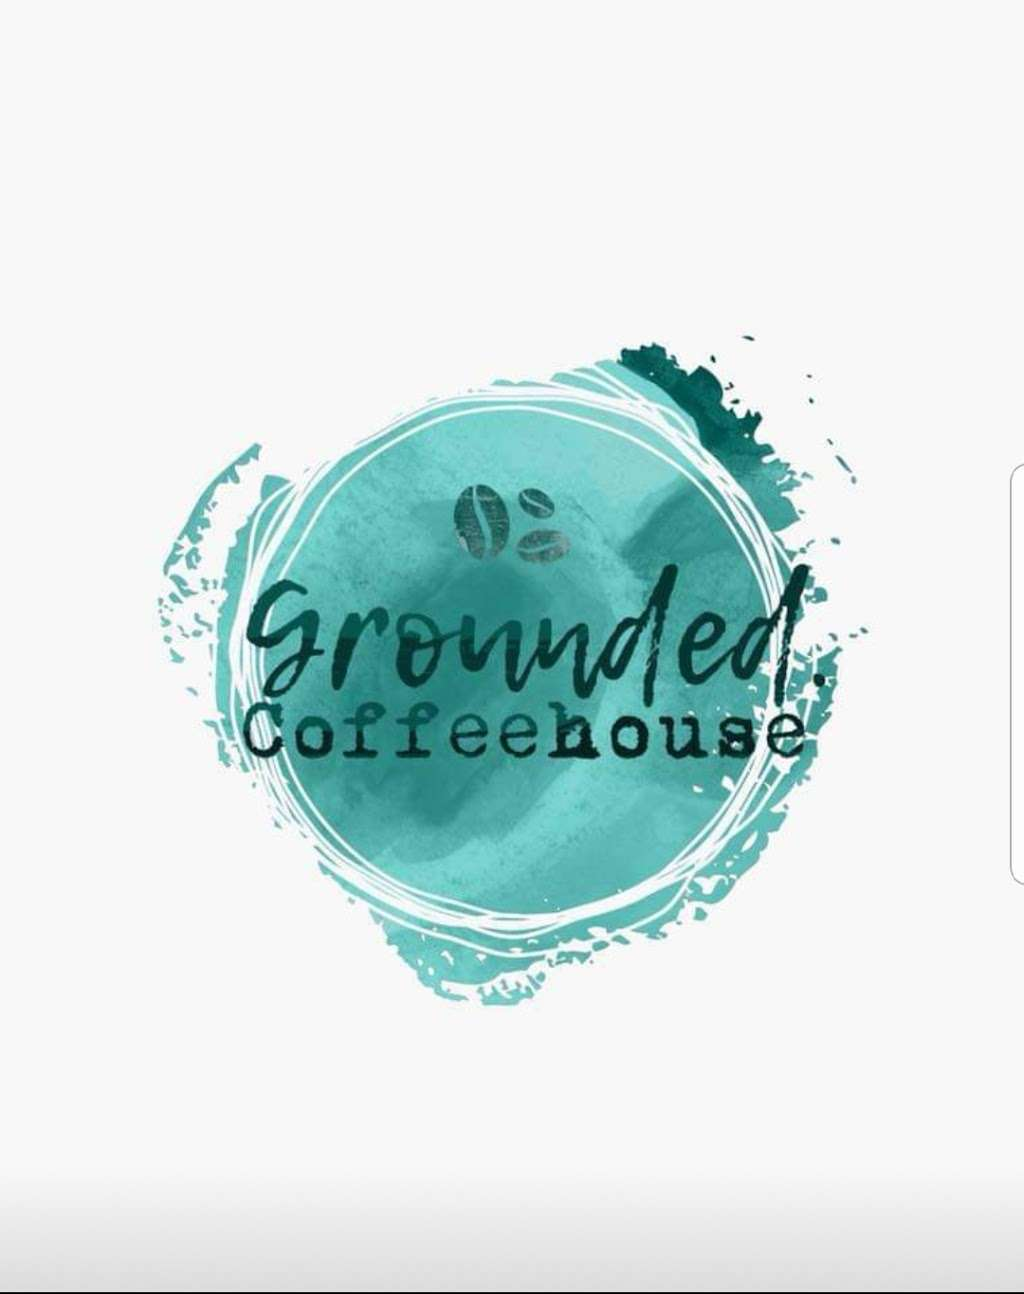 Grounded Coffeehouse - cafe  | Photo 8 of 8 | Address: 2657 E Main St, Lincolnton, NC 28092, USA | Phone: (980) 429-2052